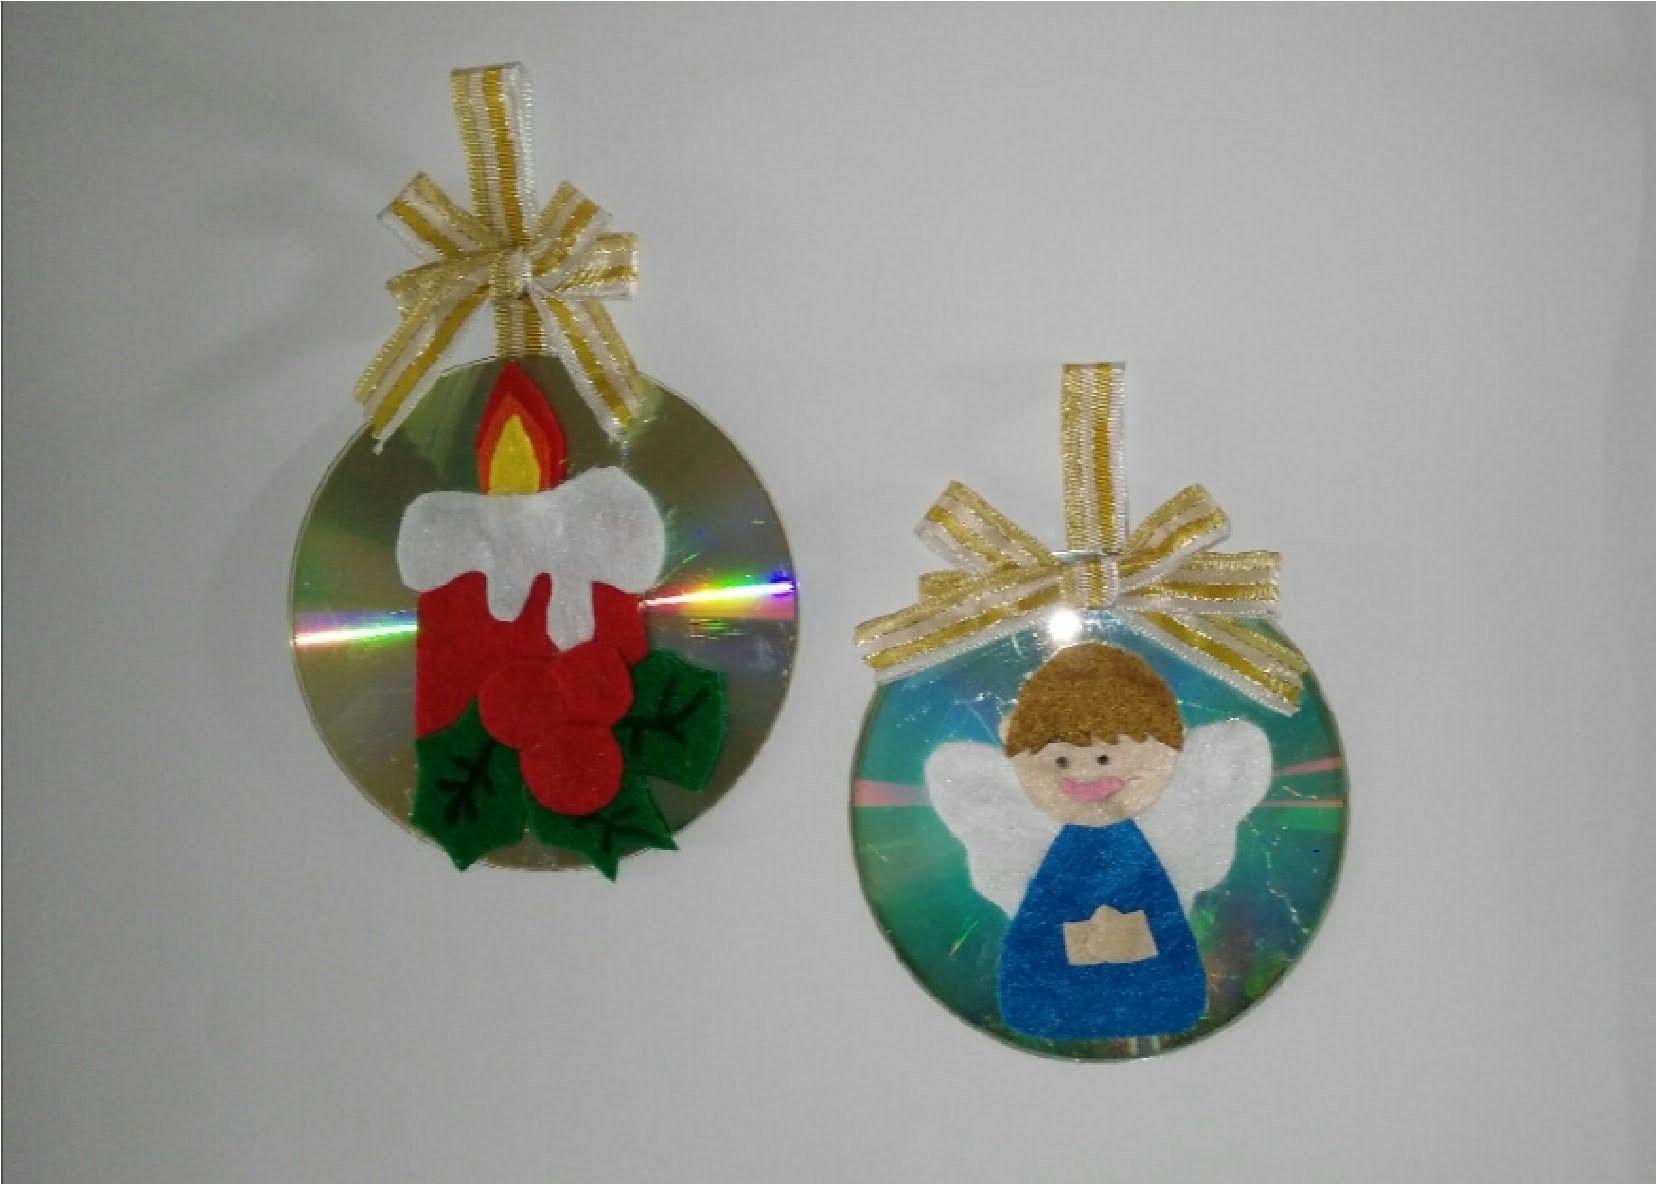 Como hacer adornos navide os con cd para el arbol de - Adornos navidenos de papel ...